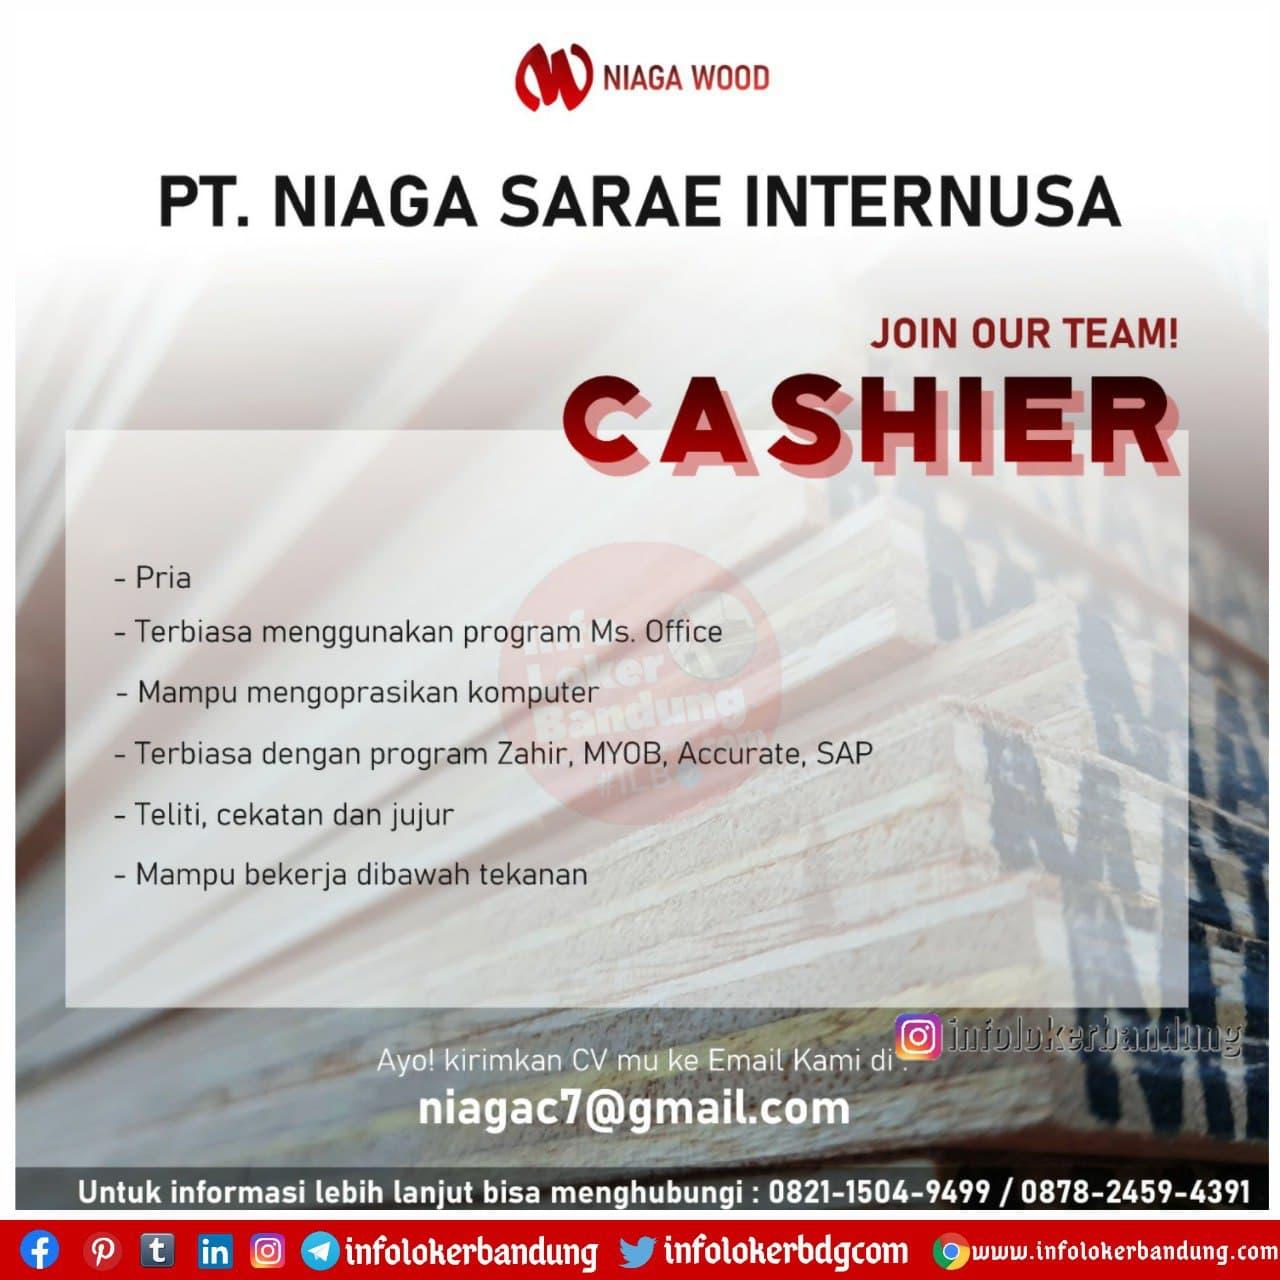 Lowongan Kerja PT. Niaga Sarae Internusa ( Niaga Wood ) Bandung Januari 2021